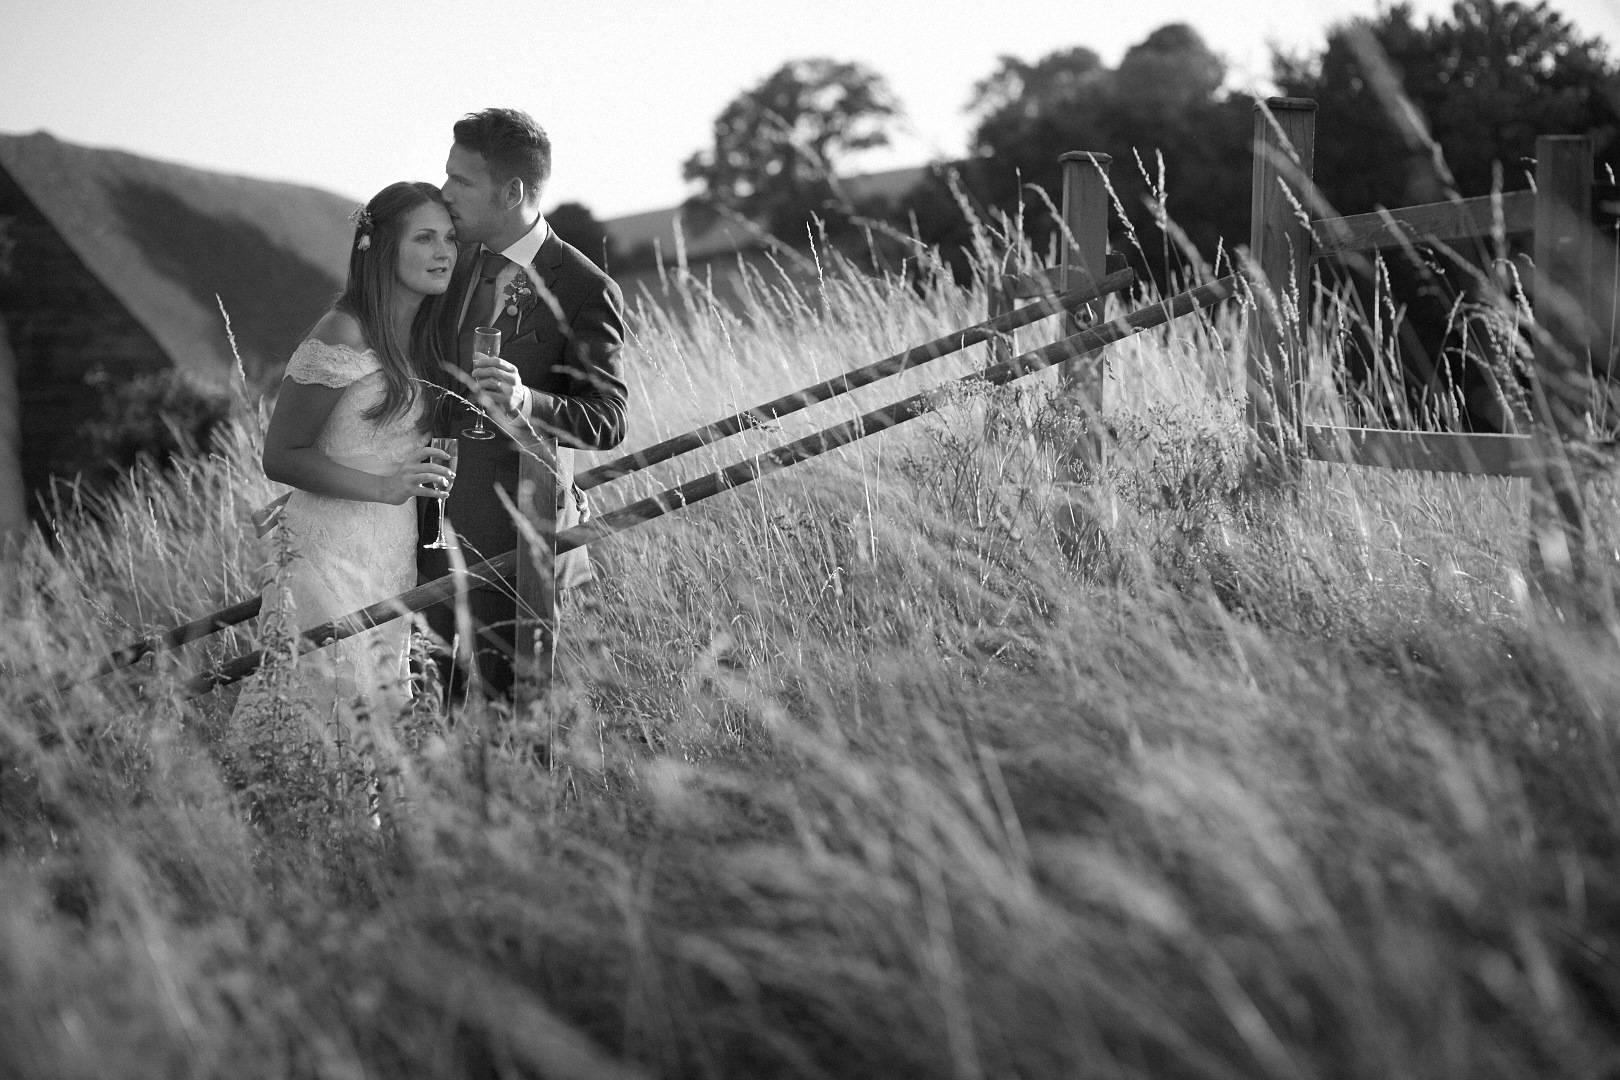 George and Leah's Wedding, Upwaltham Barns.